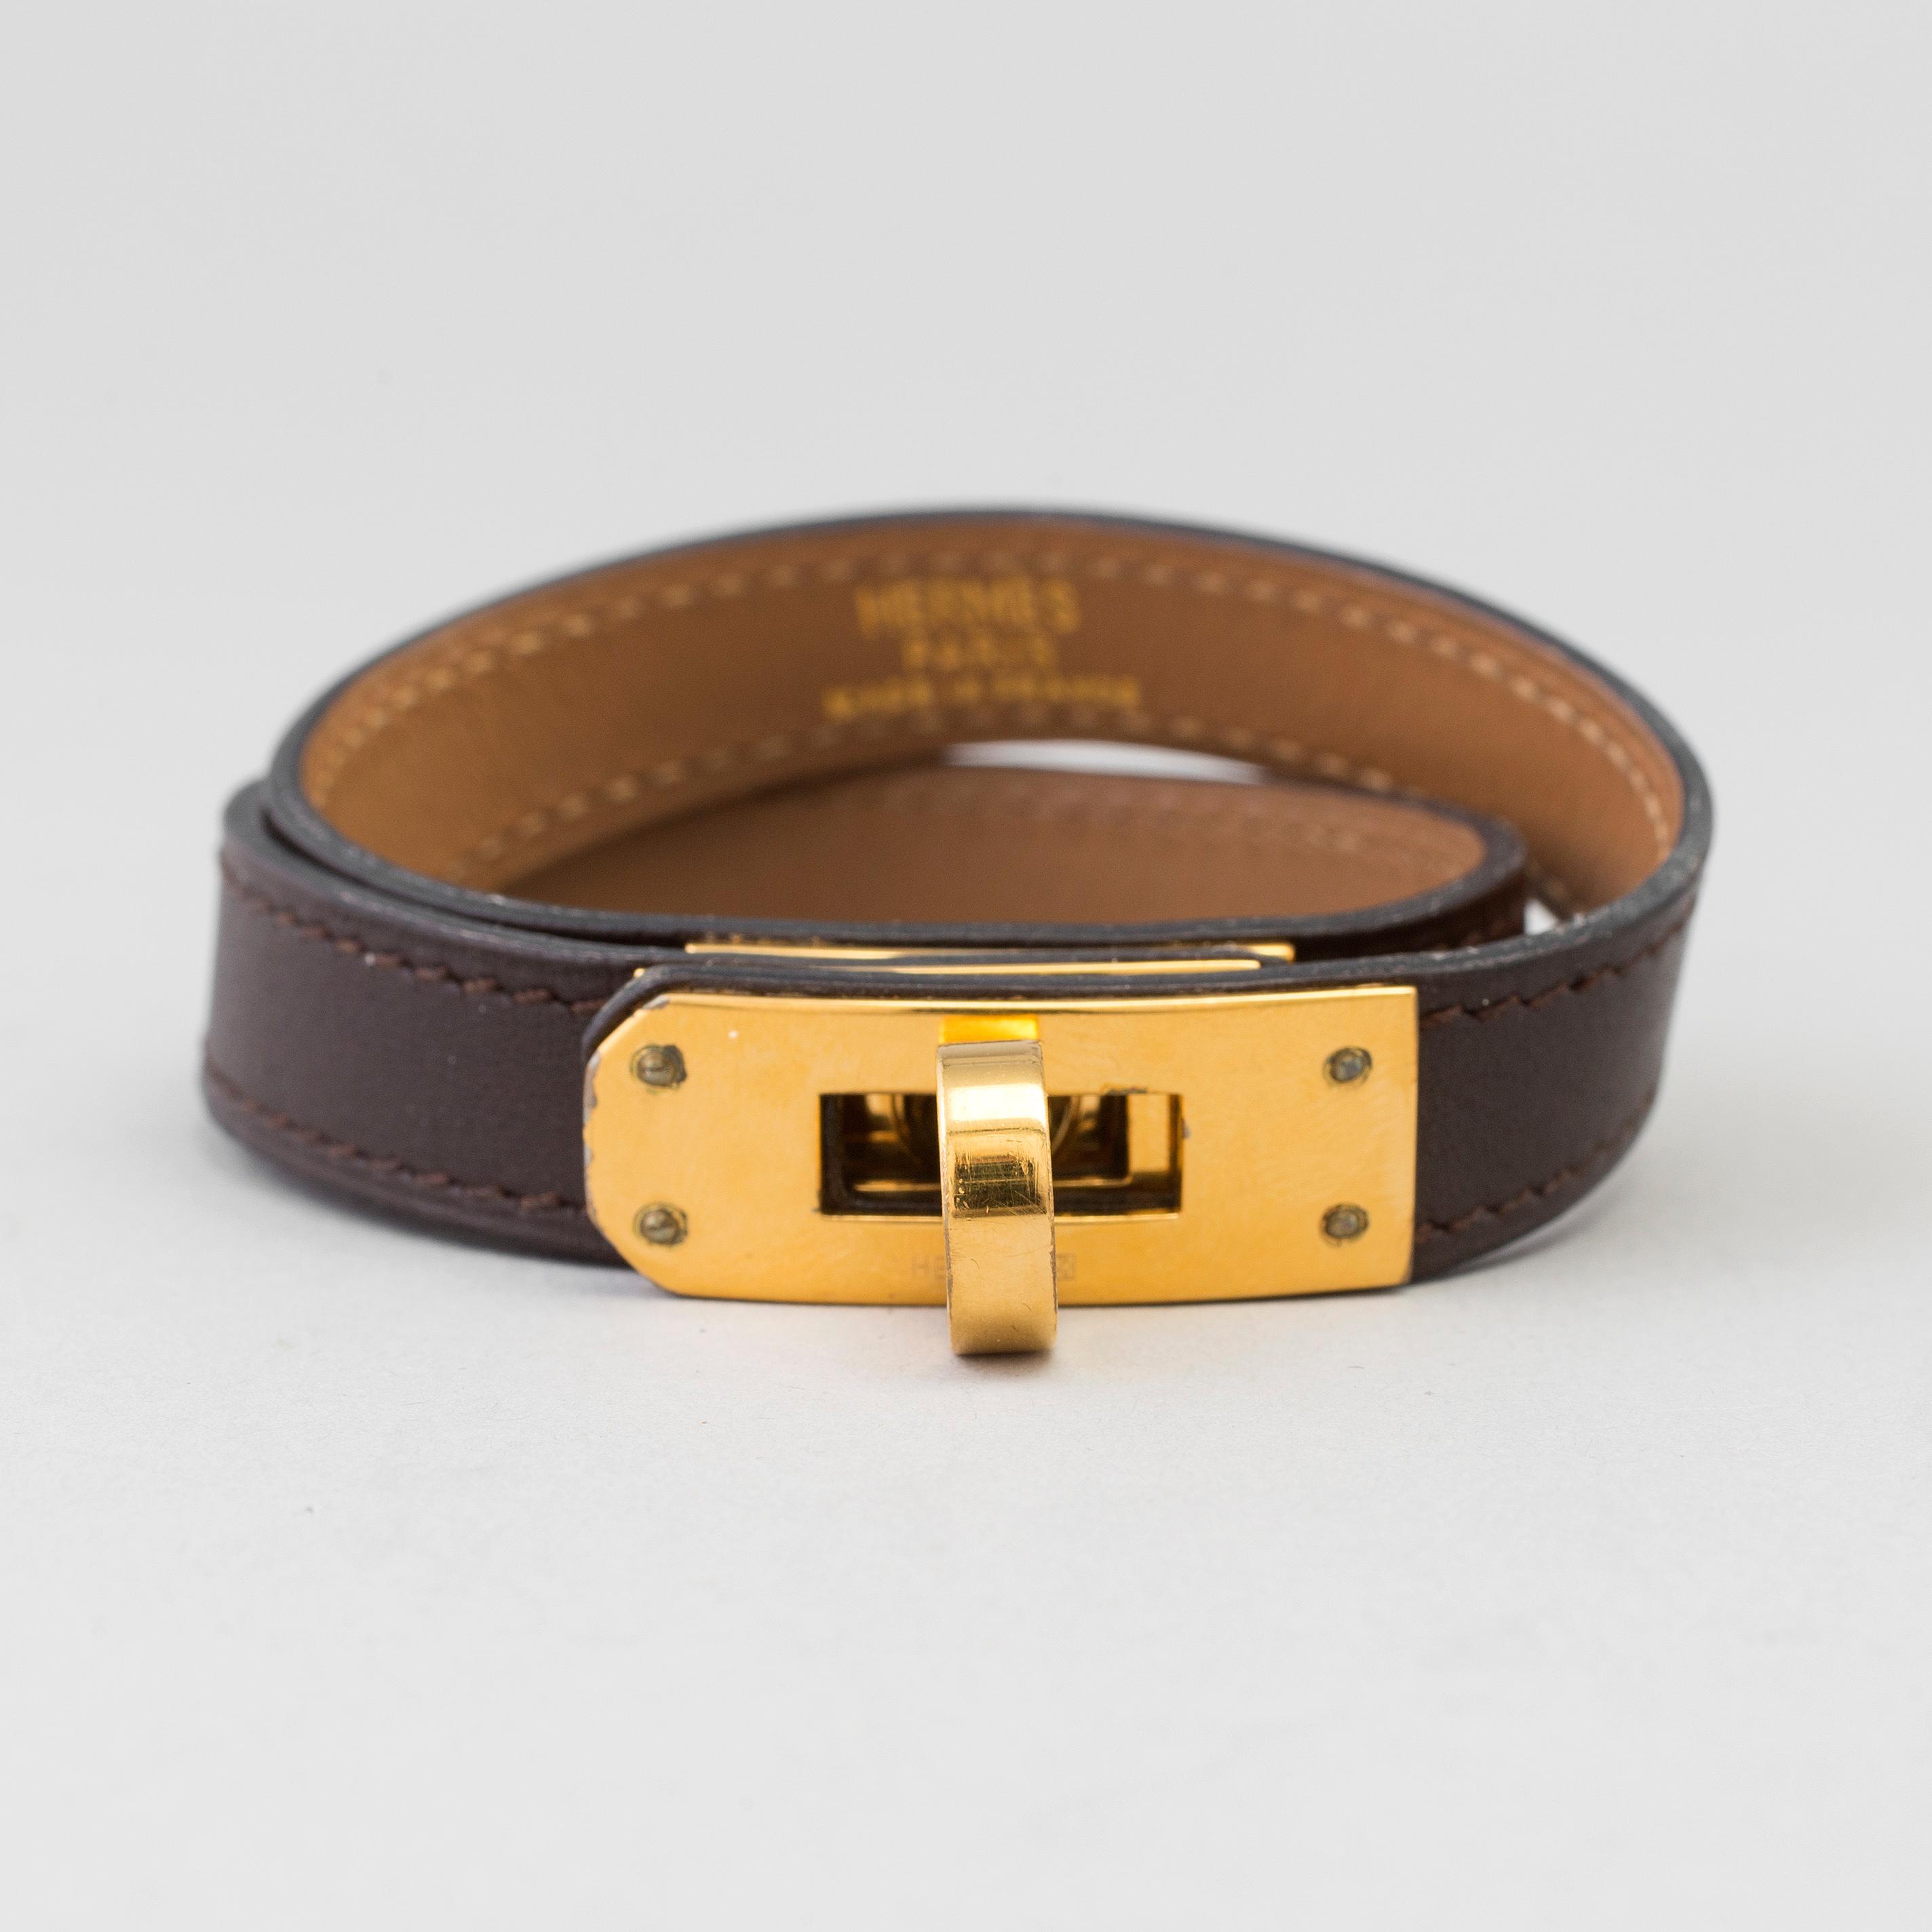 5e59fd6624c A Hermés bracelet